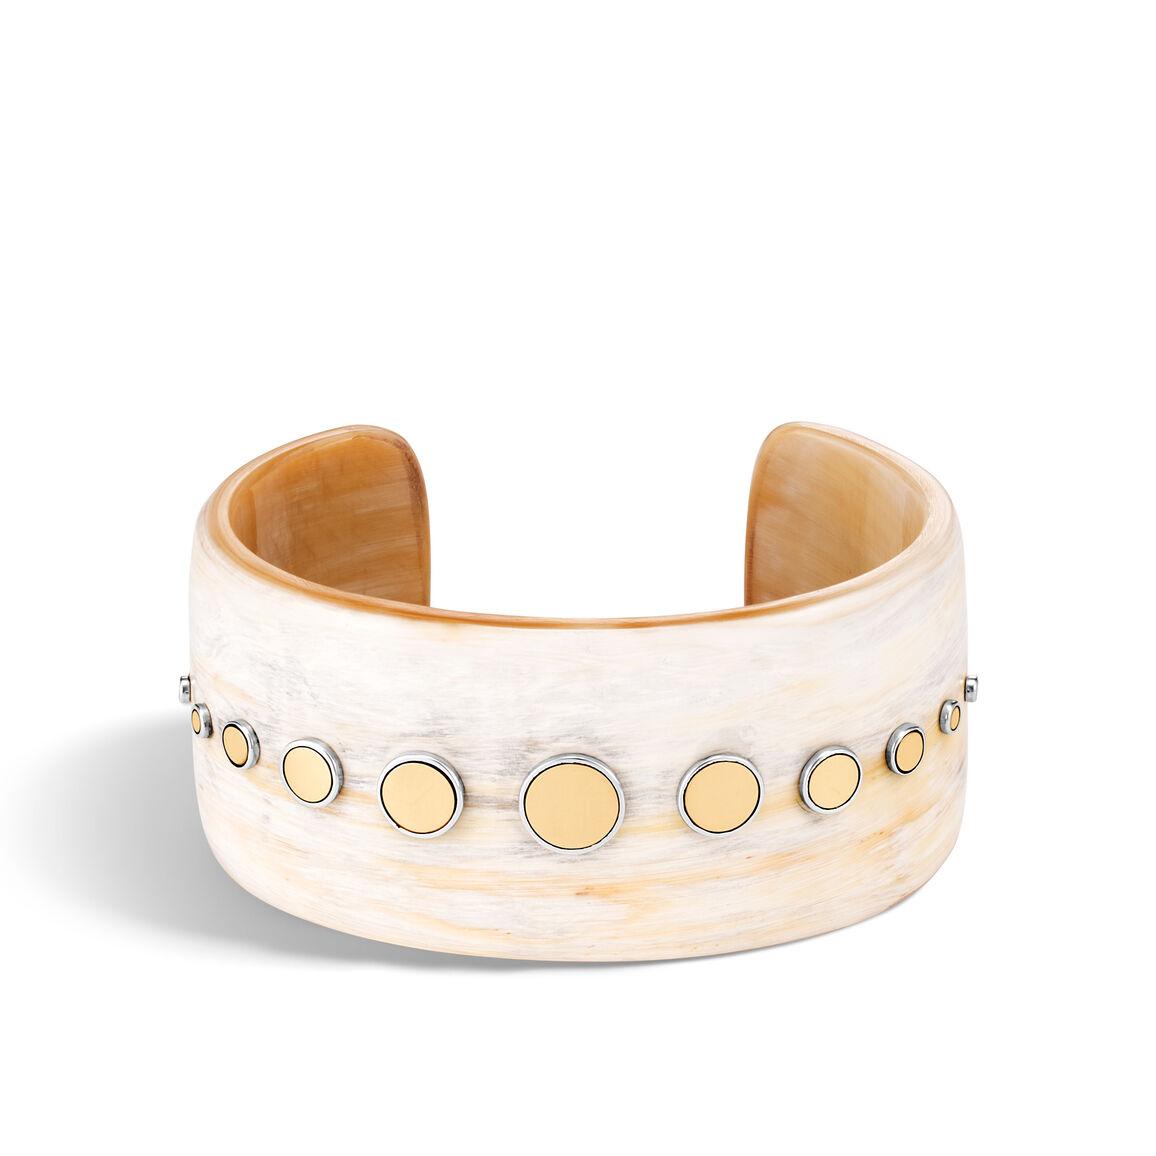 Dot 31.5MM Buffalo Horn Cuff in Silver and 18K Gold